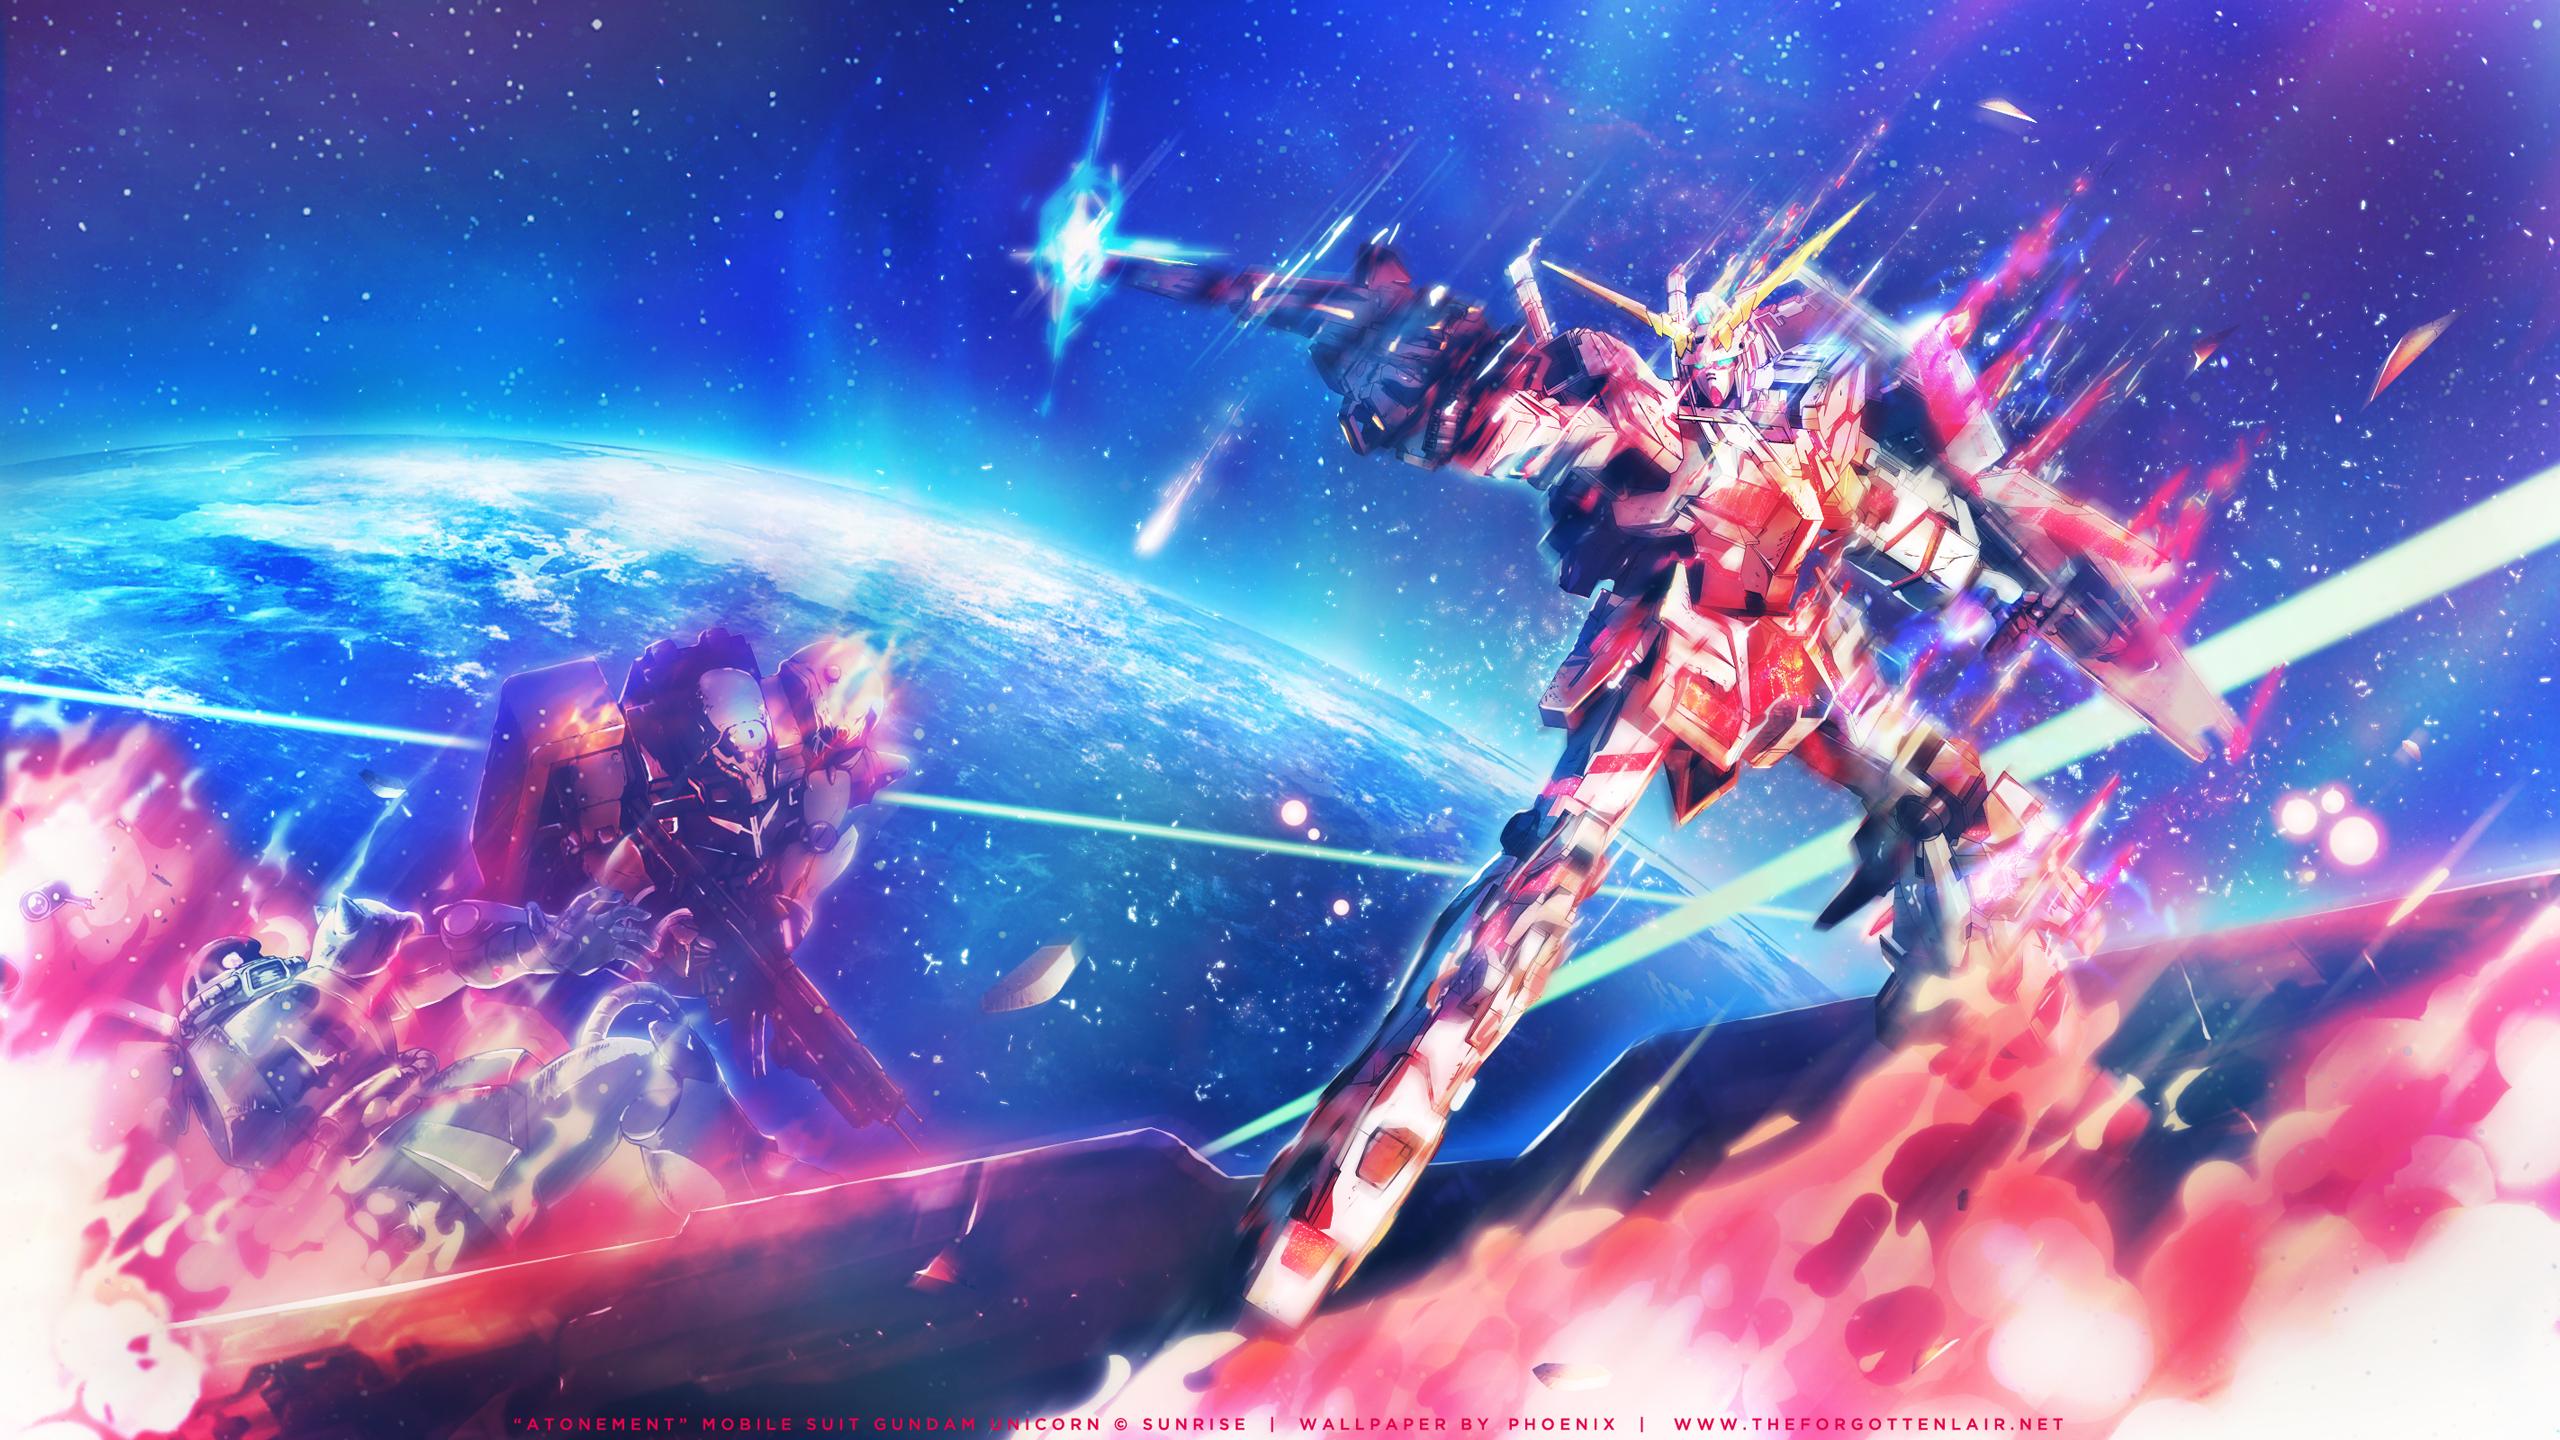 Mobile Suit Gundam Unicorn 2560x1440 Animewallpaper